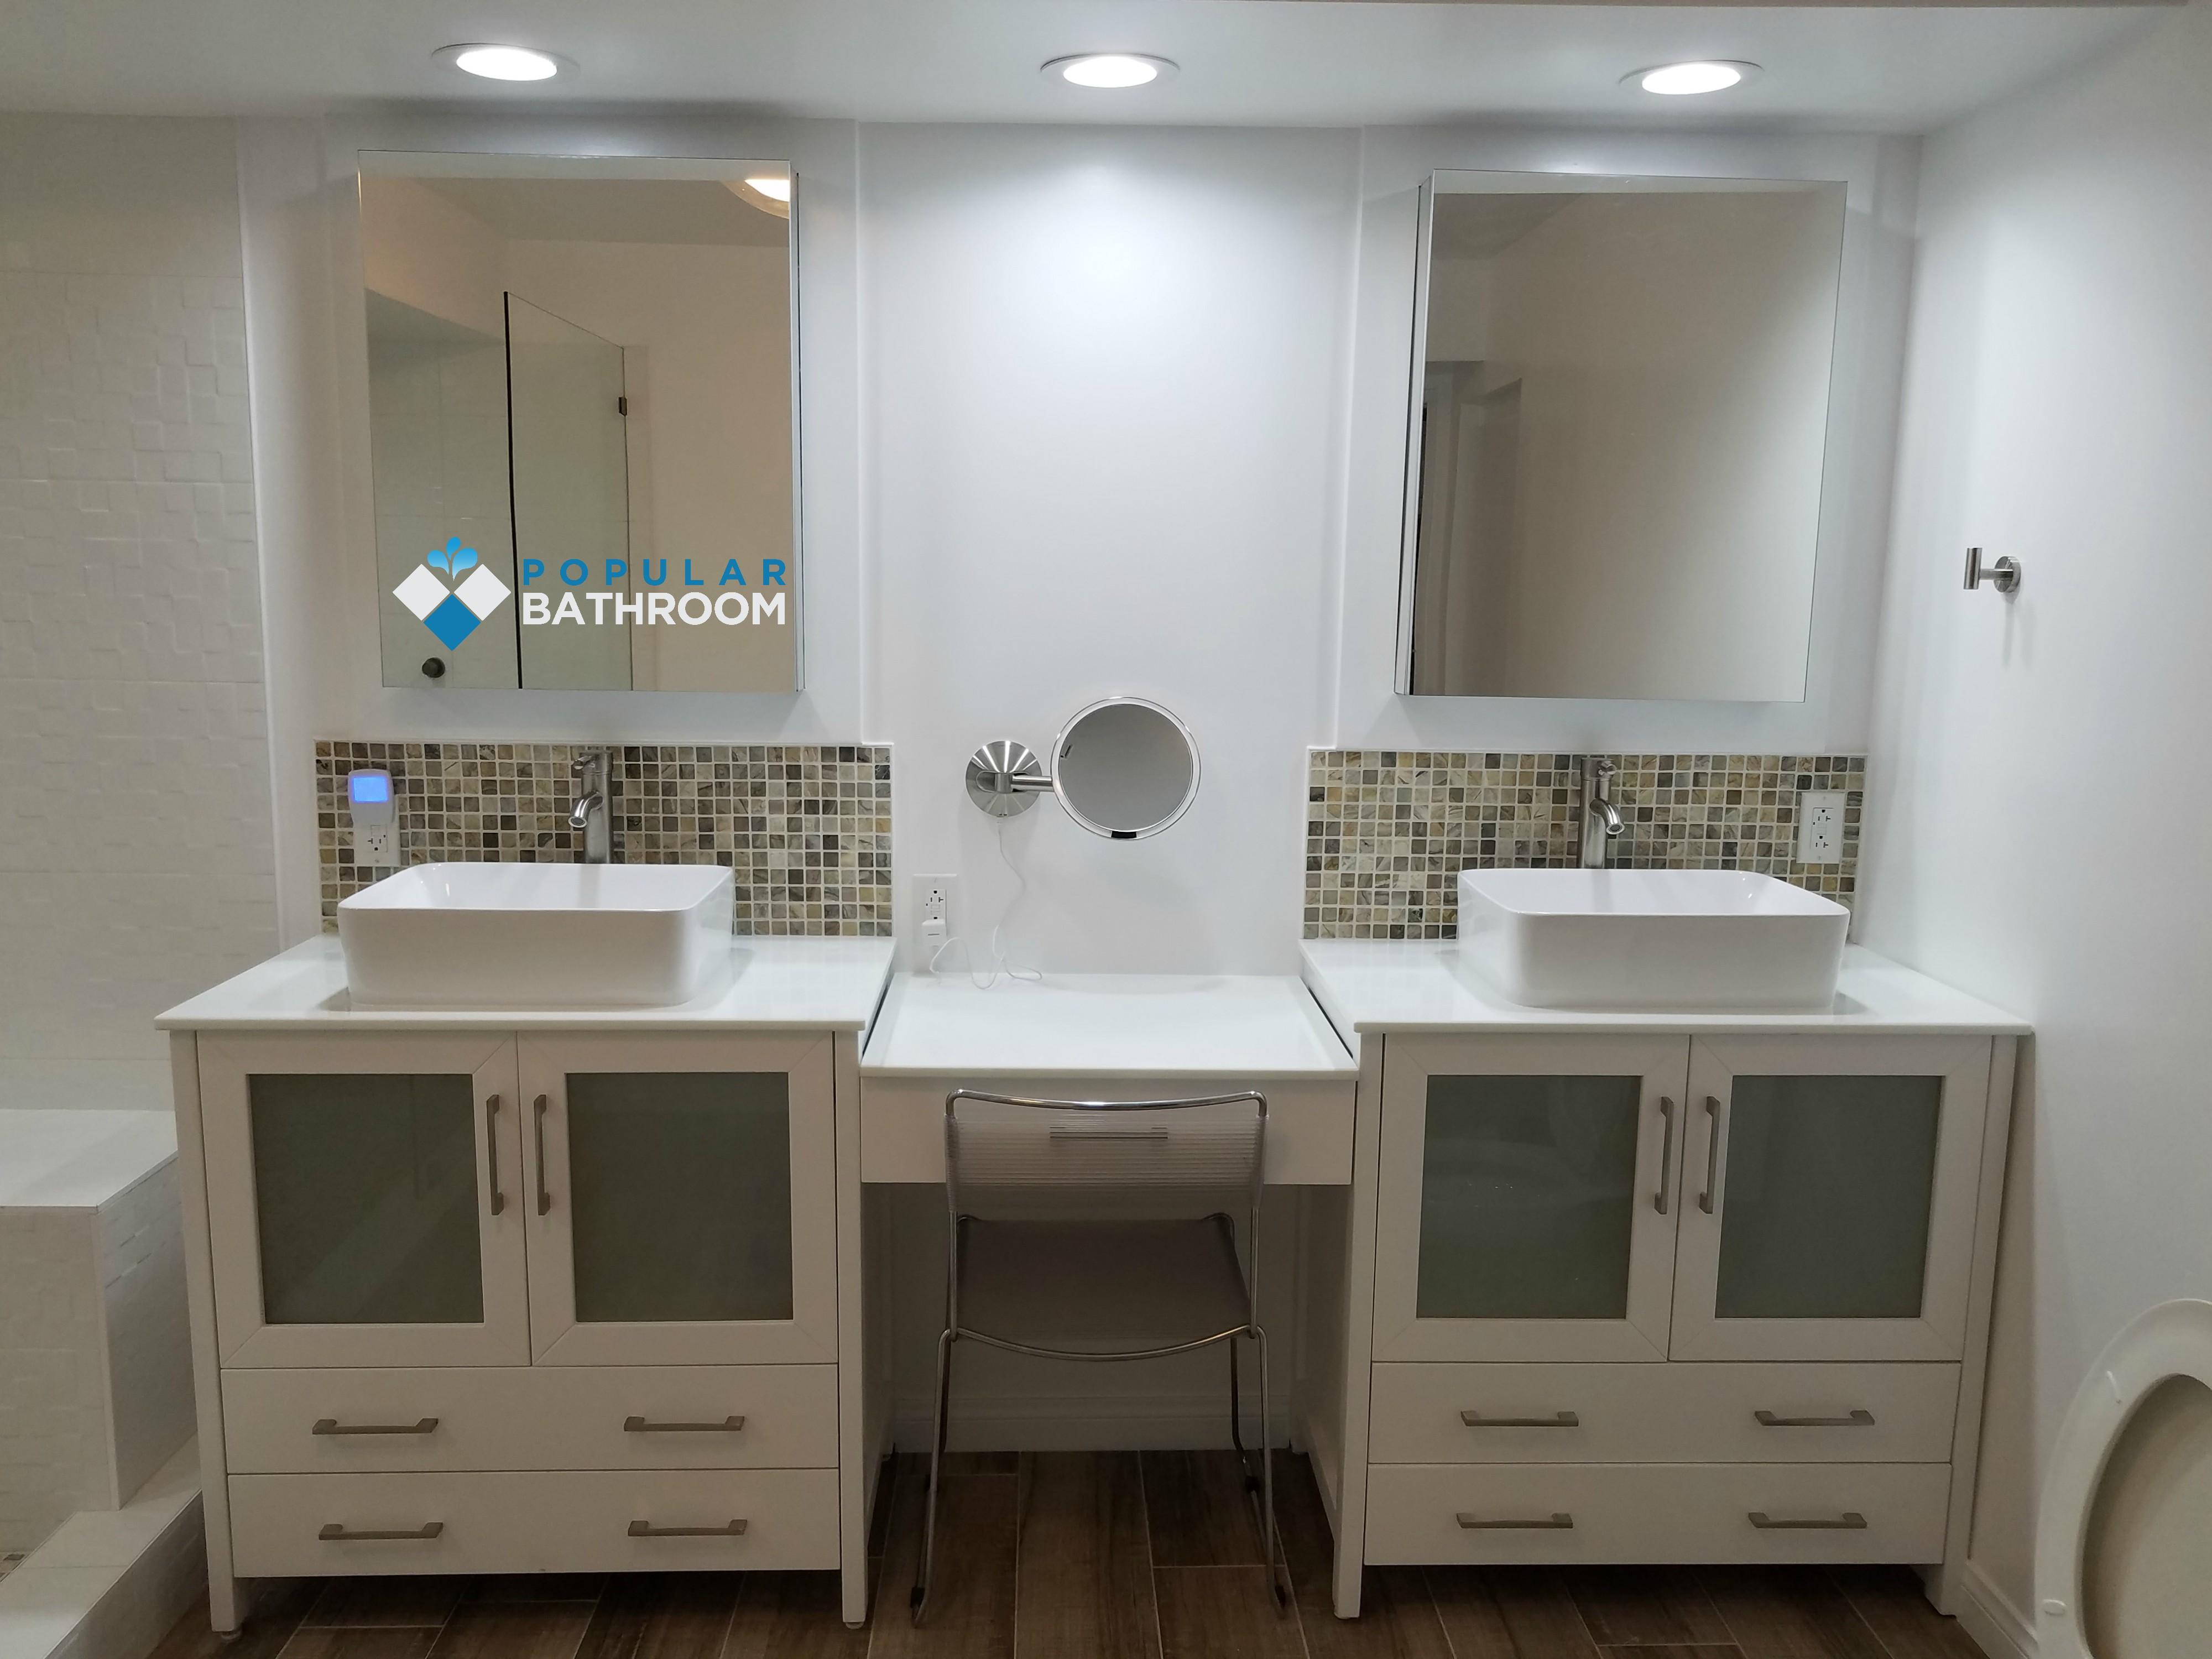 Popular Bathroom image 40